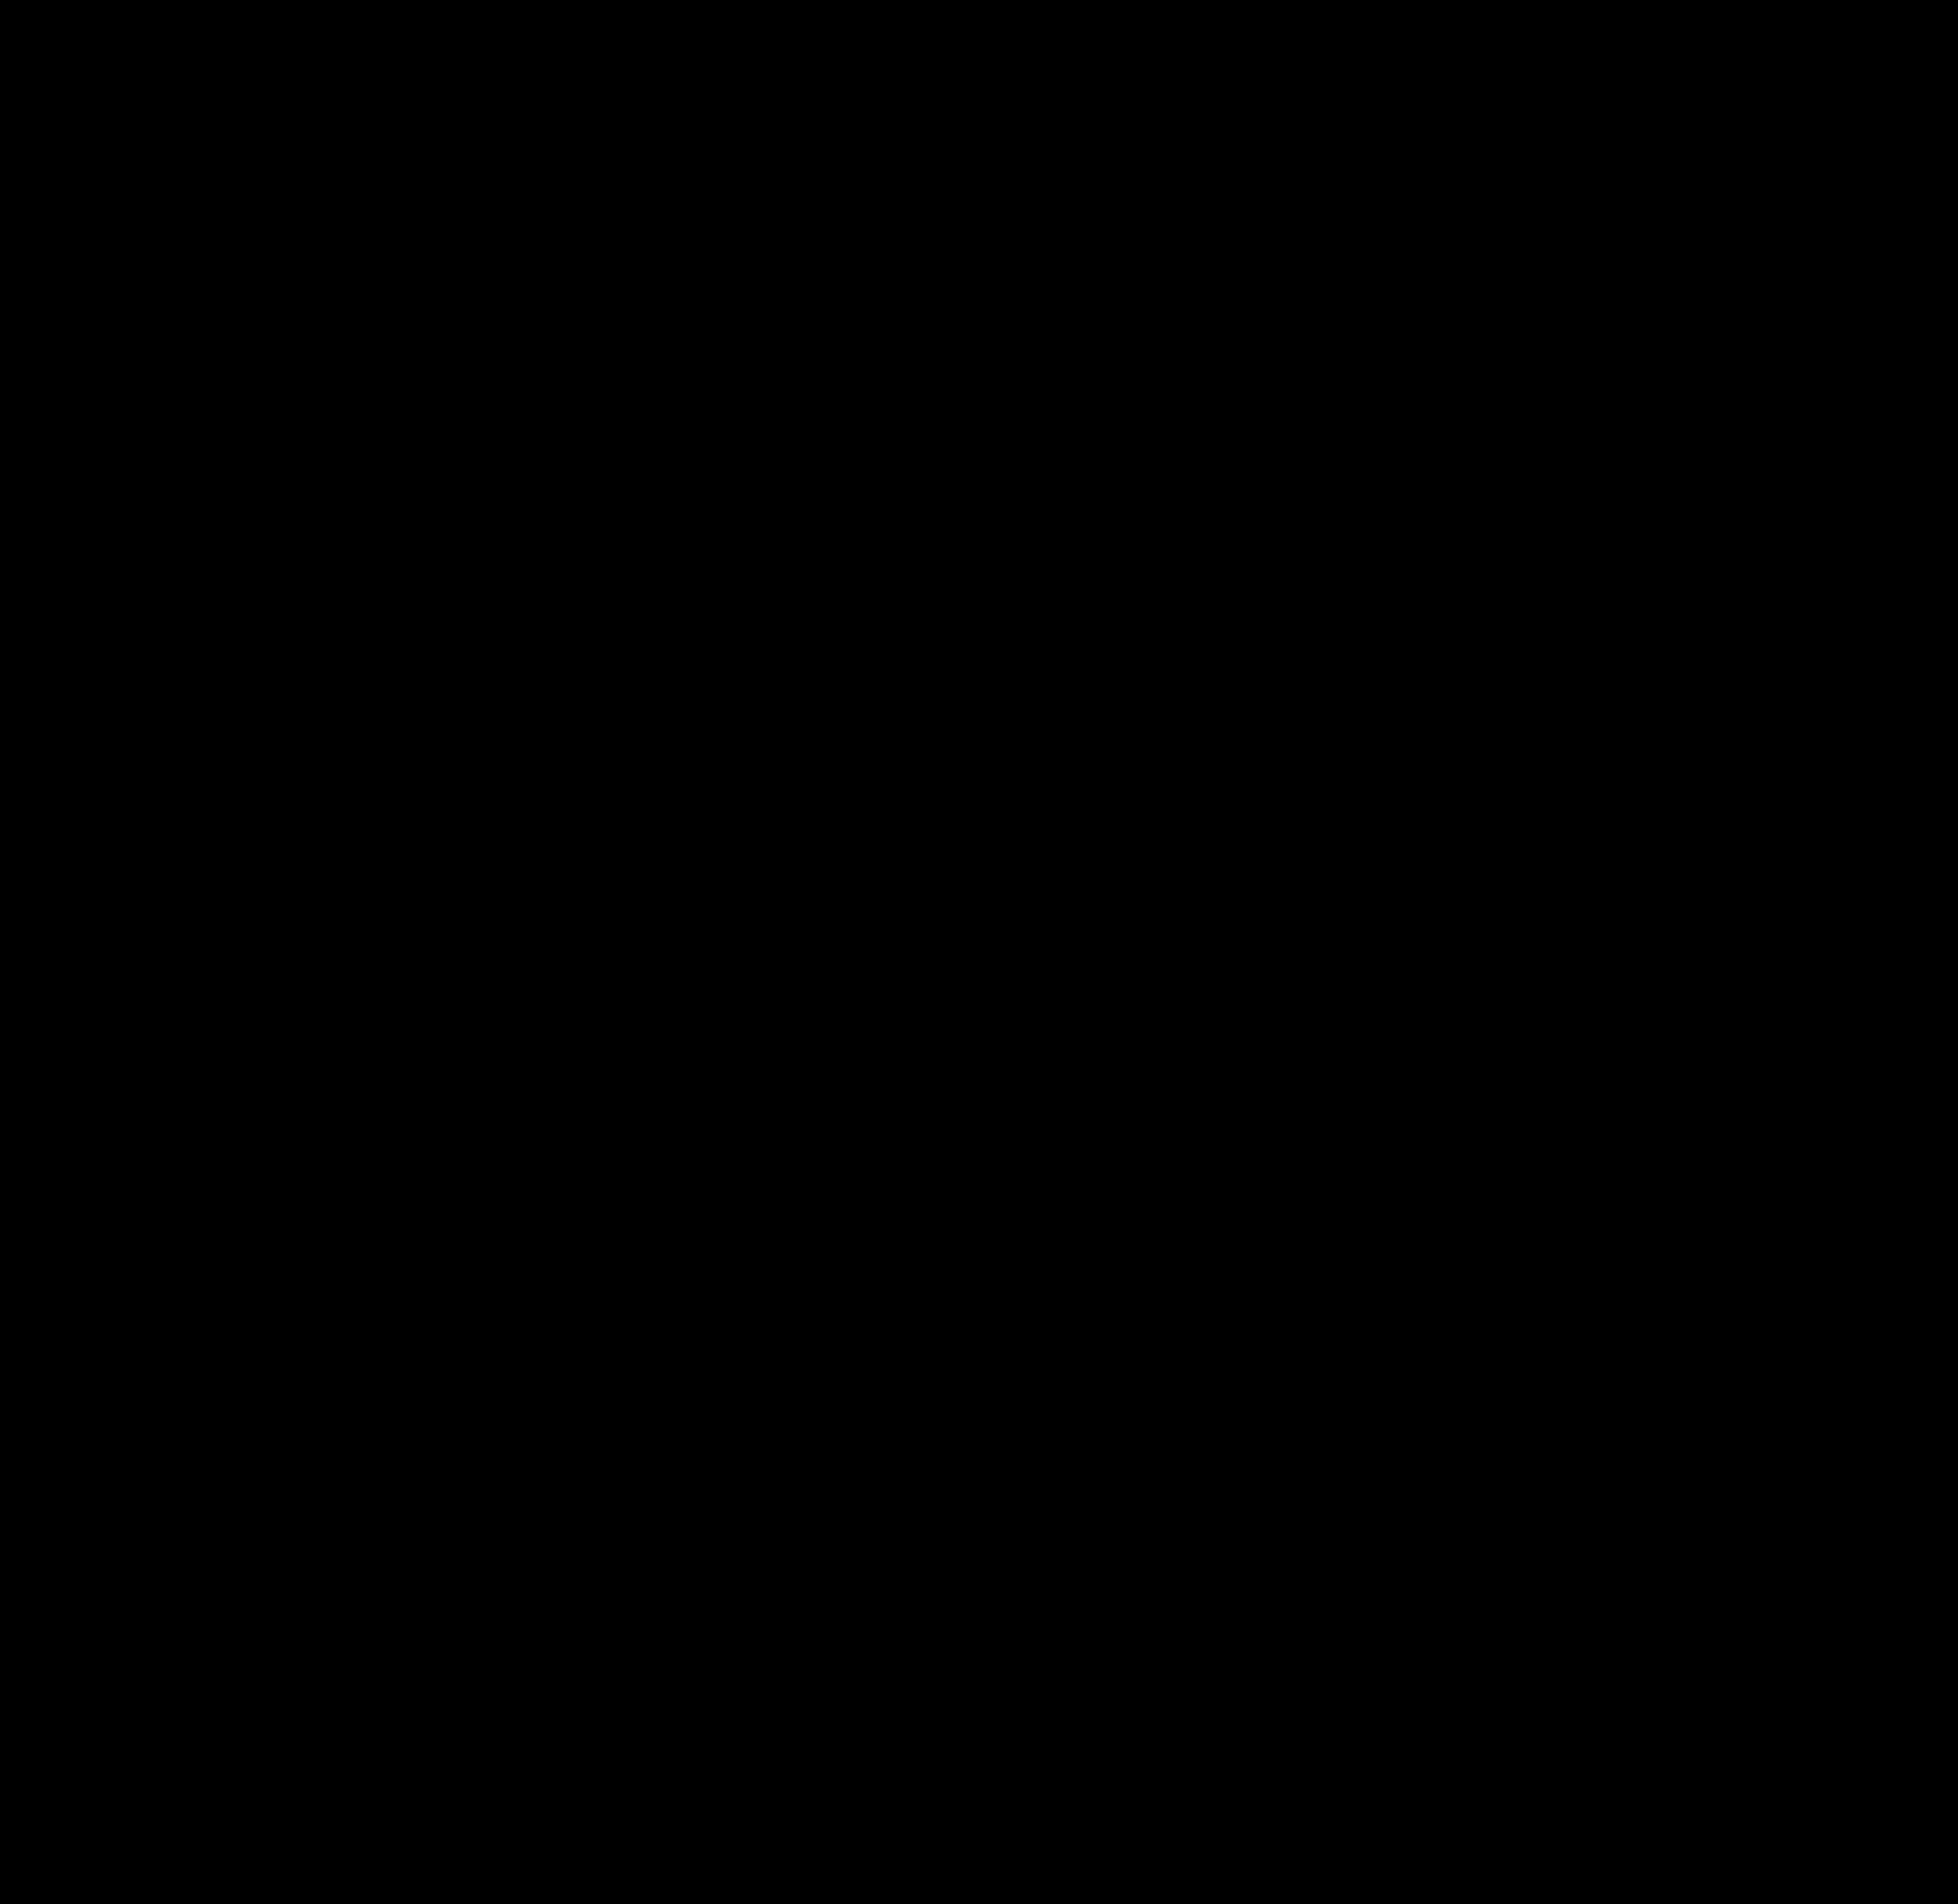 adidas logo png images free download rh pngimg com adidas logo font download adidas logo font style